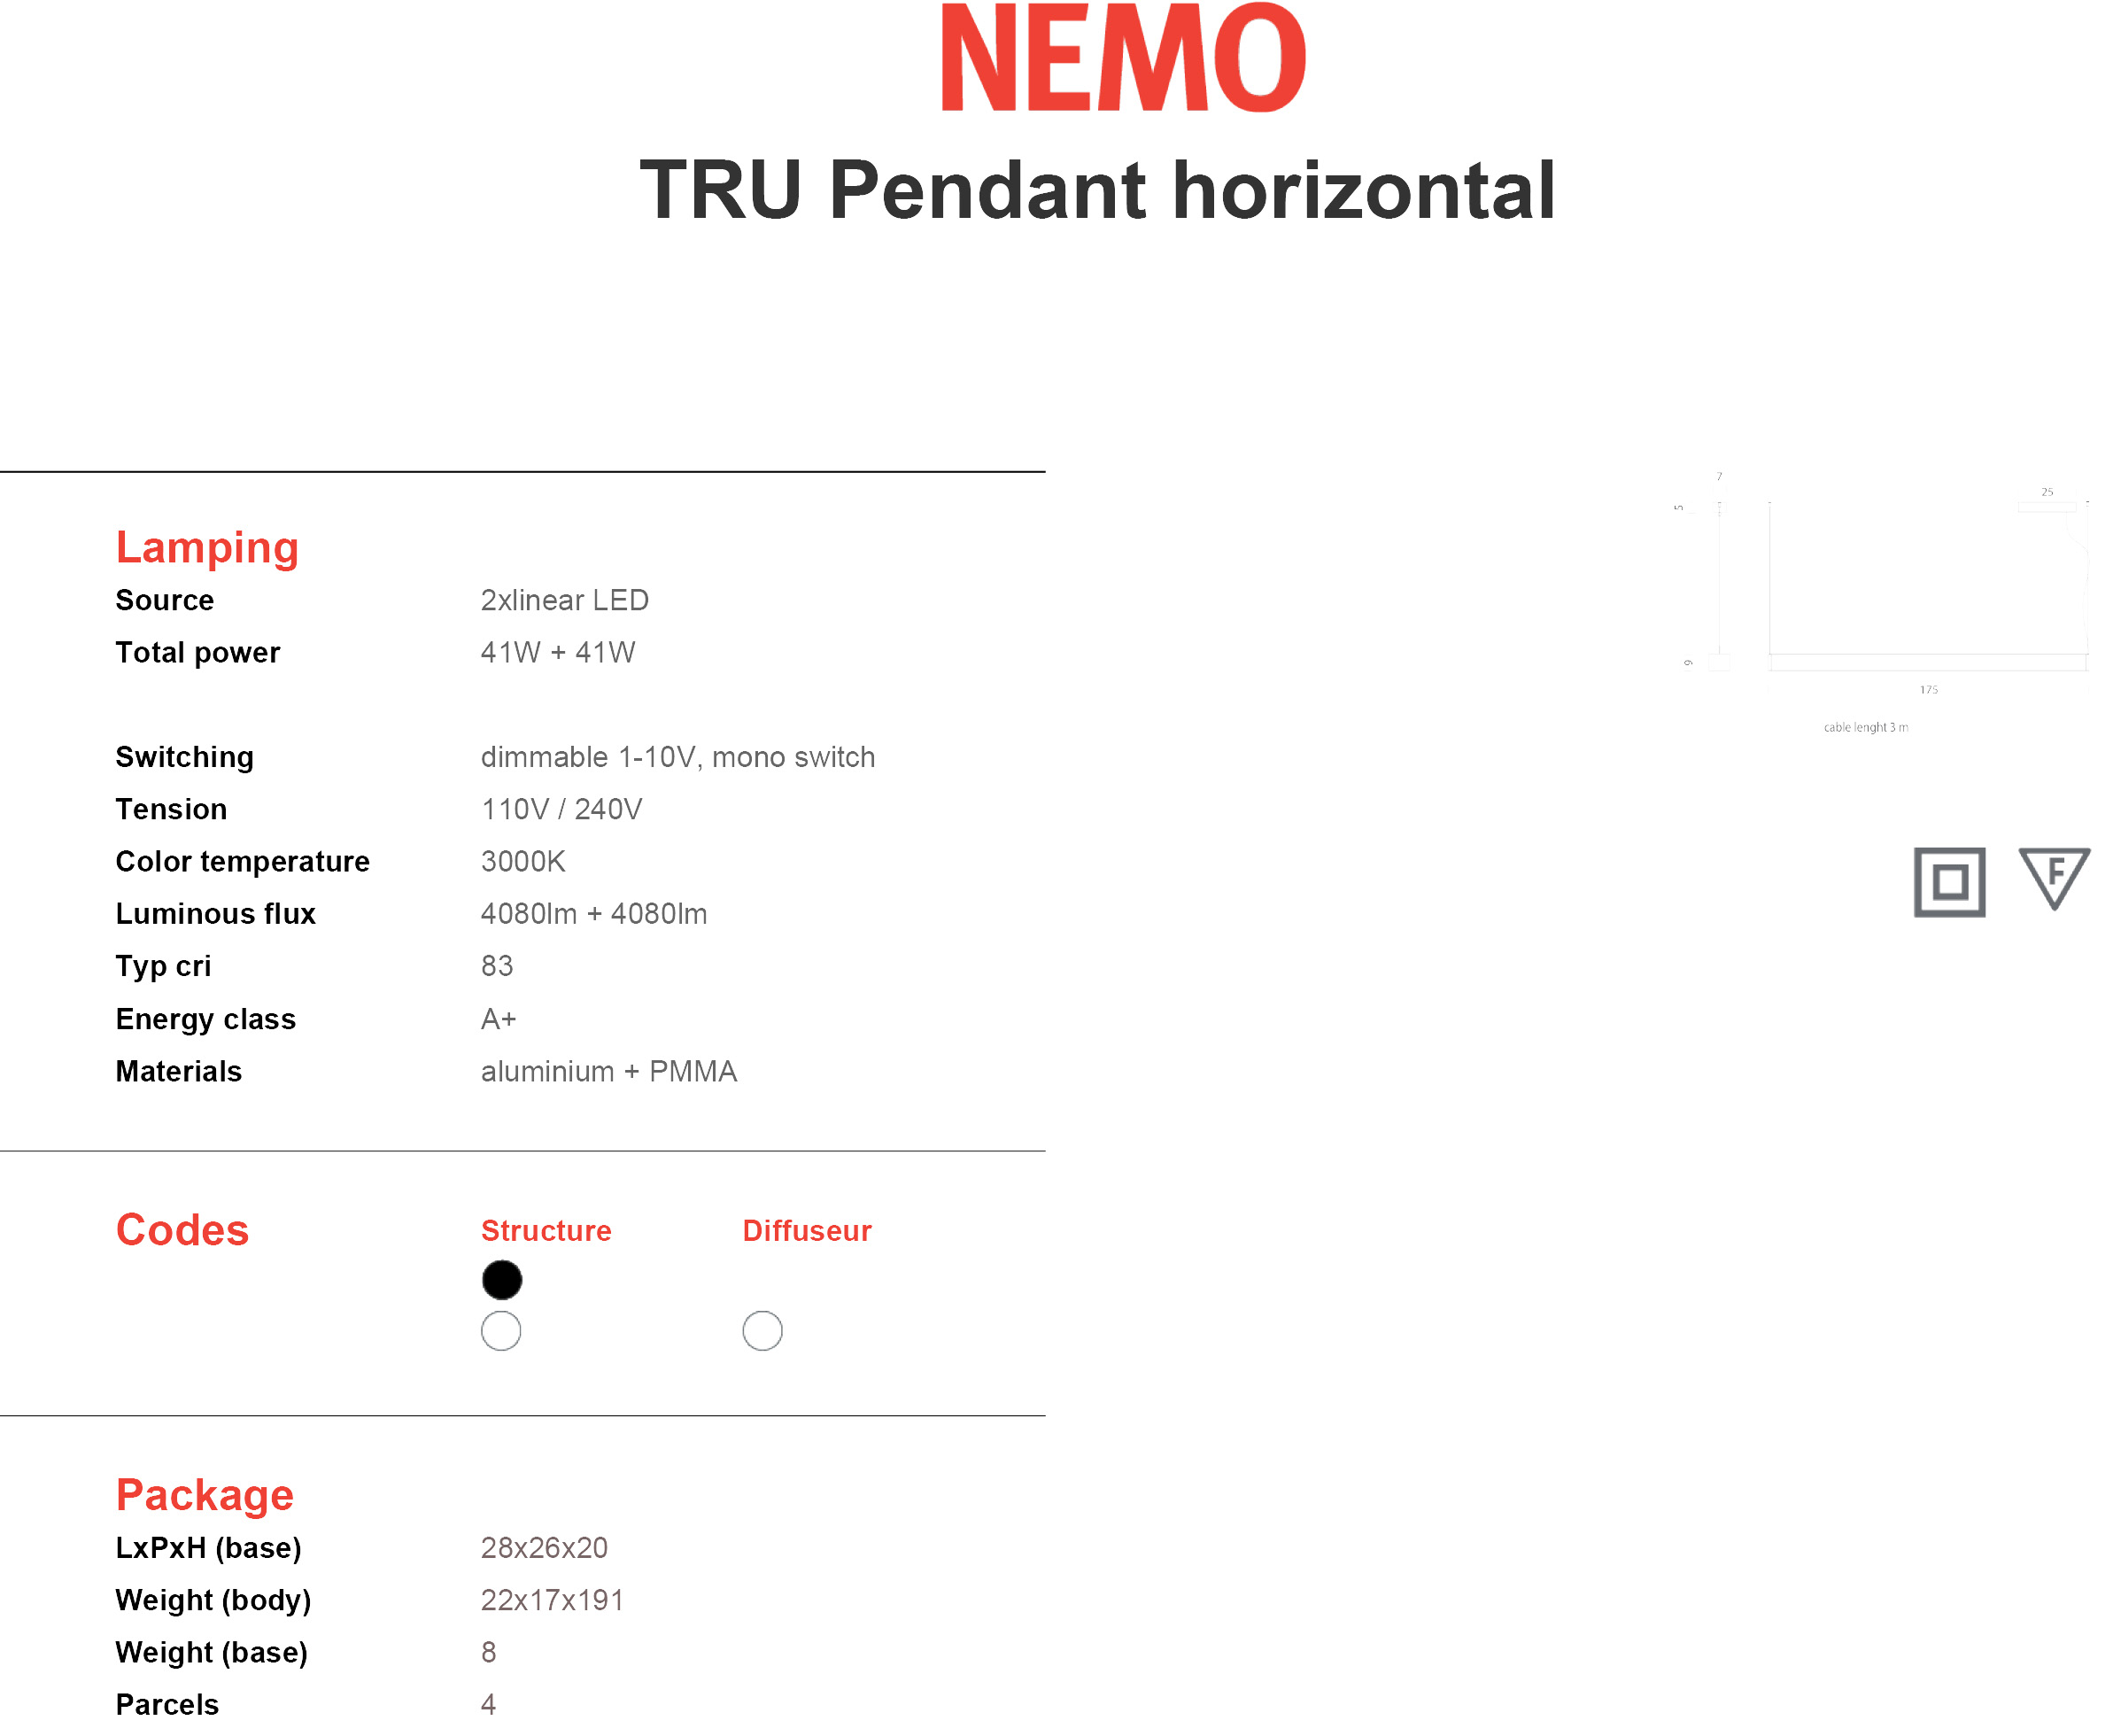 Nemo Tru Pendant Horizontal Tech